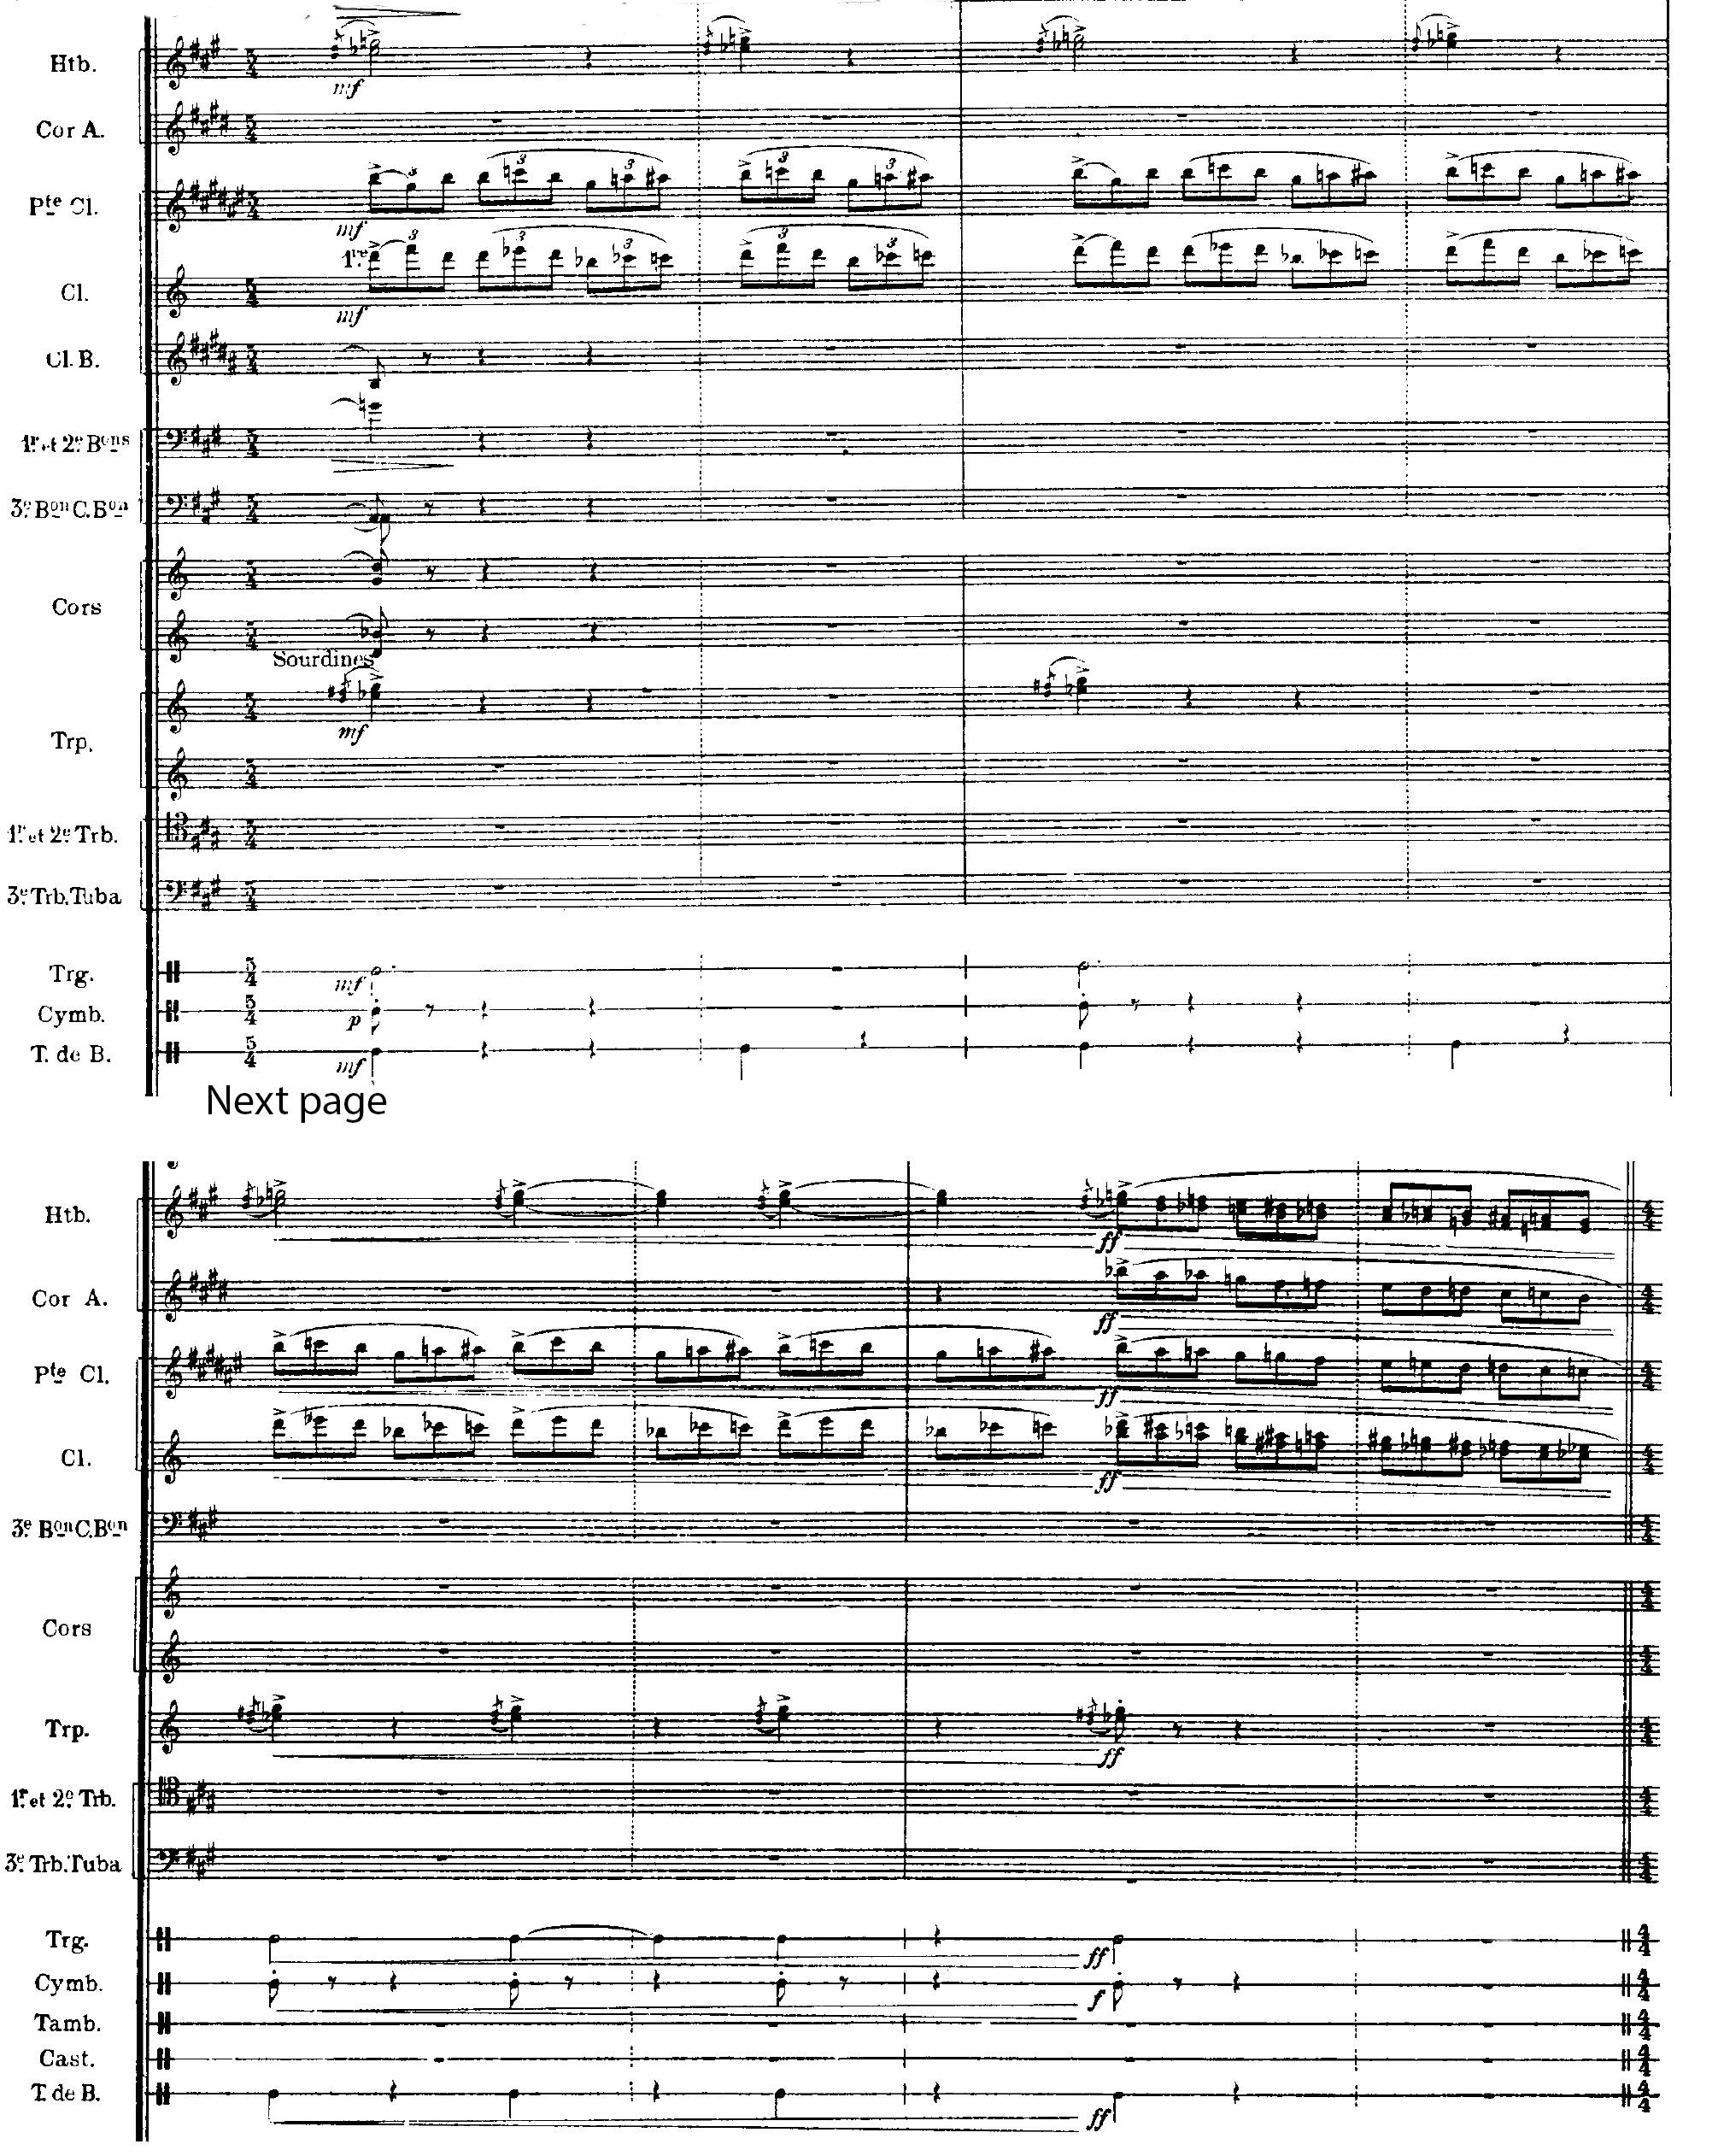 Form, Formalism, Formaldehyde - The Boston Musical Intelligencer